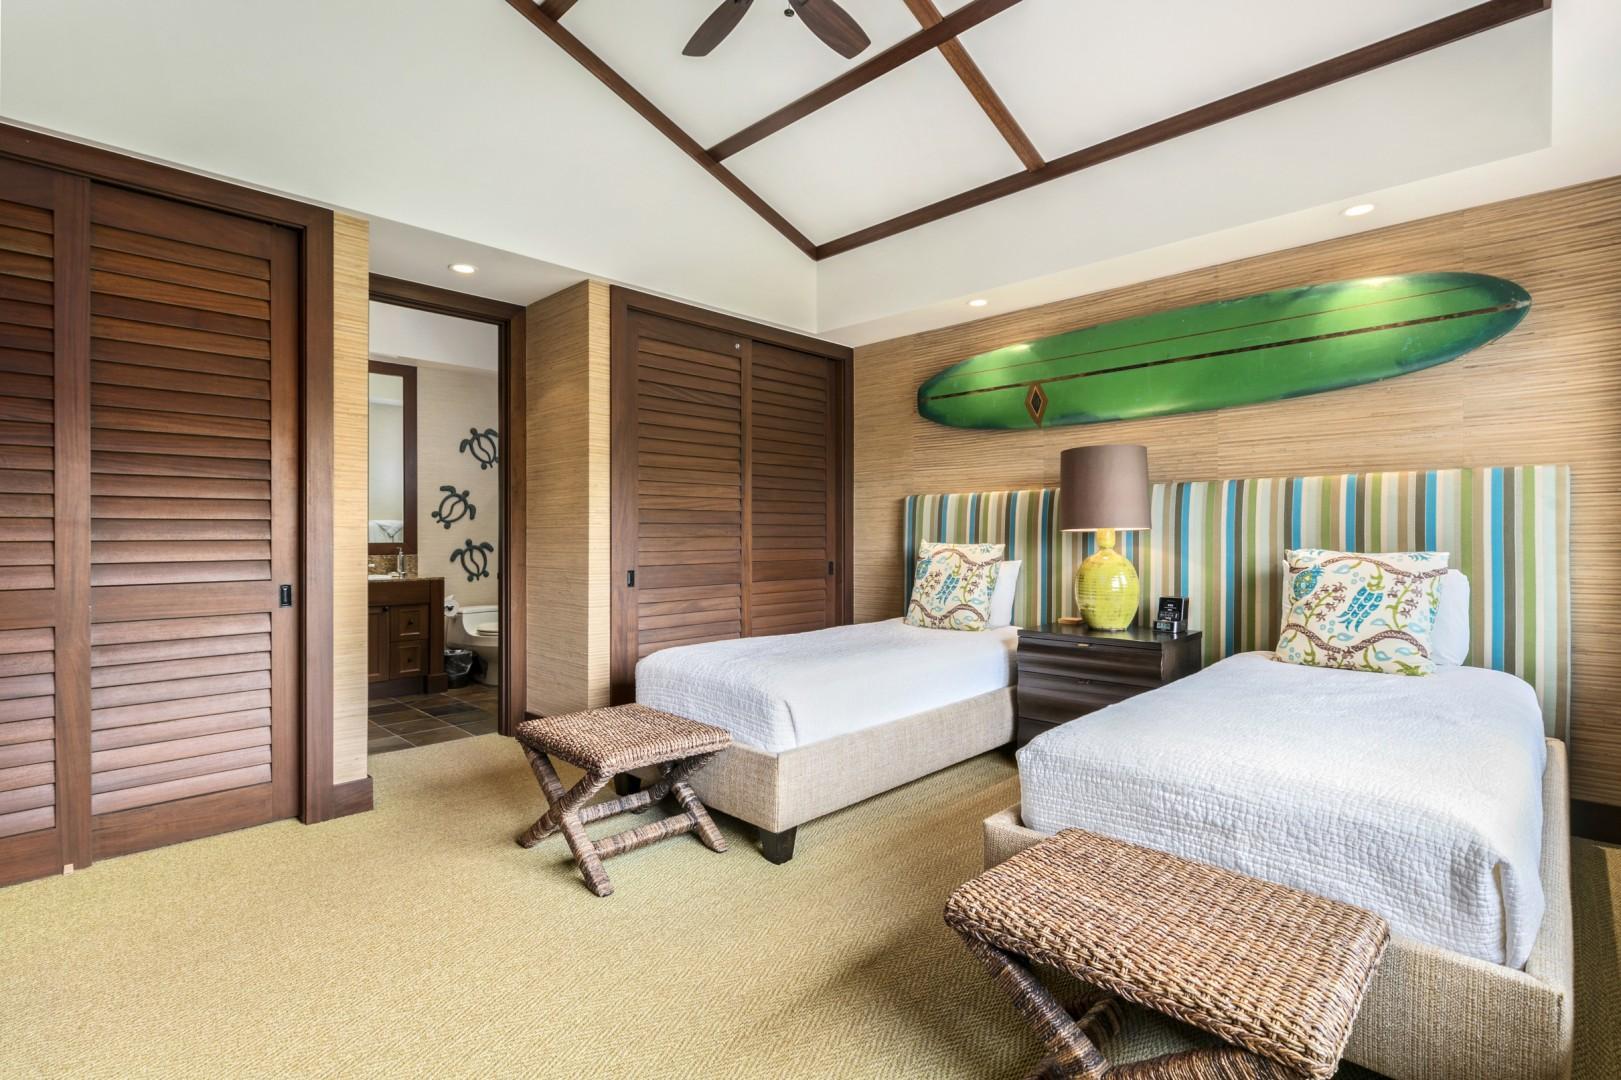 Alternate View of Second Bedroom with En Suite Bath.